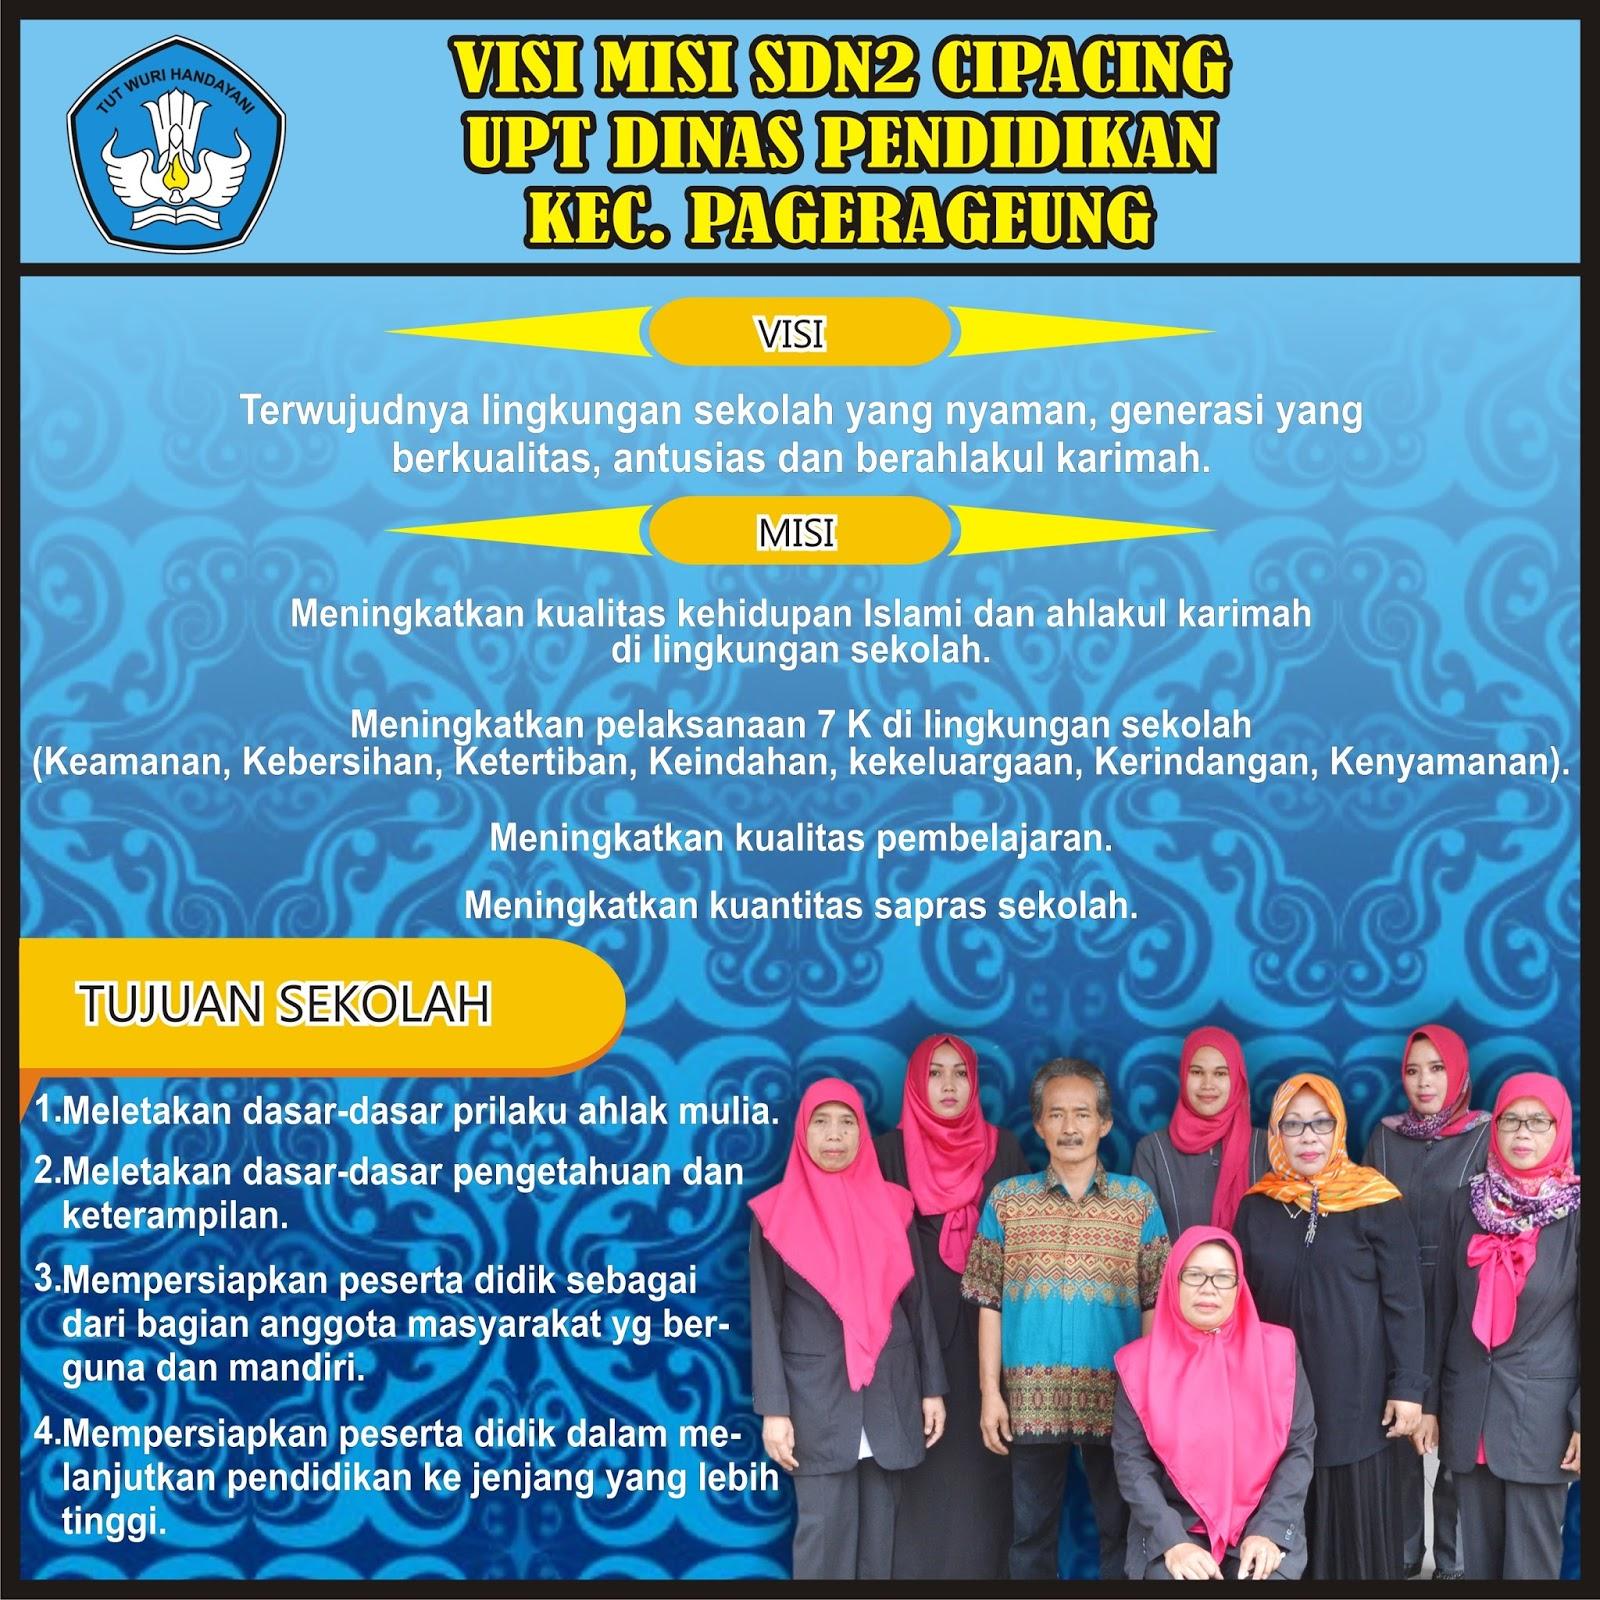 Download Contoh Banner Visi Misi Sekolah Dasar cdr | KARYAKU